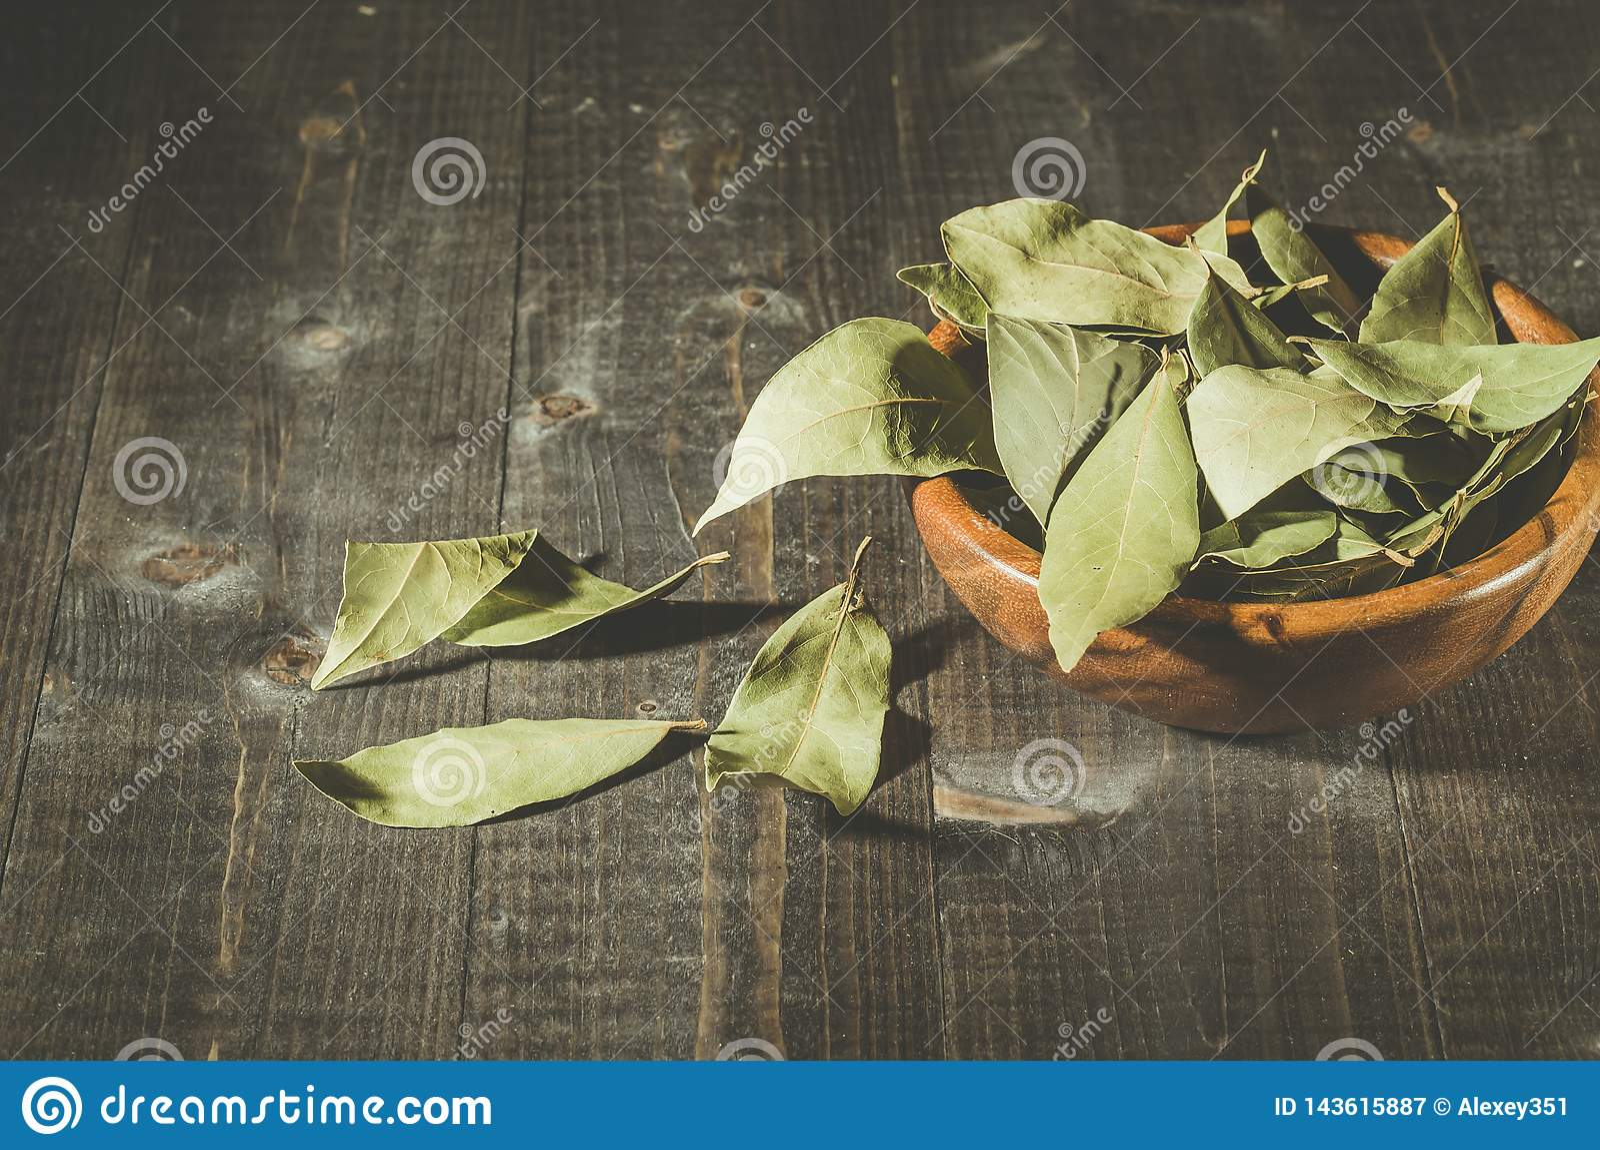 Bay leaf in a wooden bowl/bay leaf on a wooden surface dark wooden background